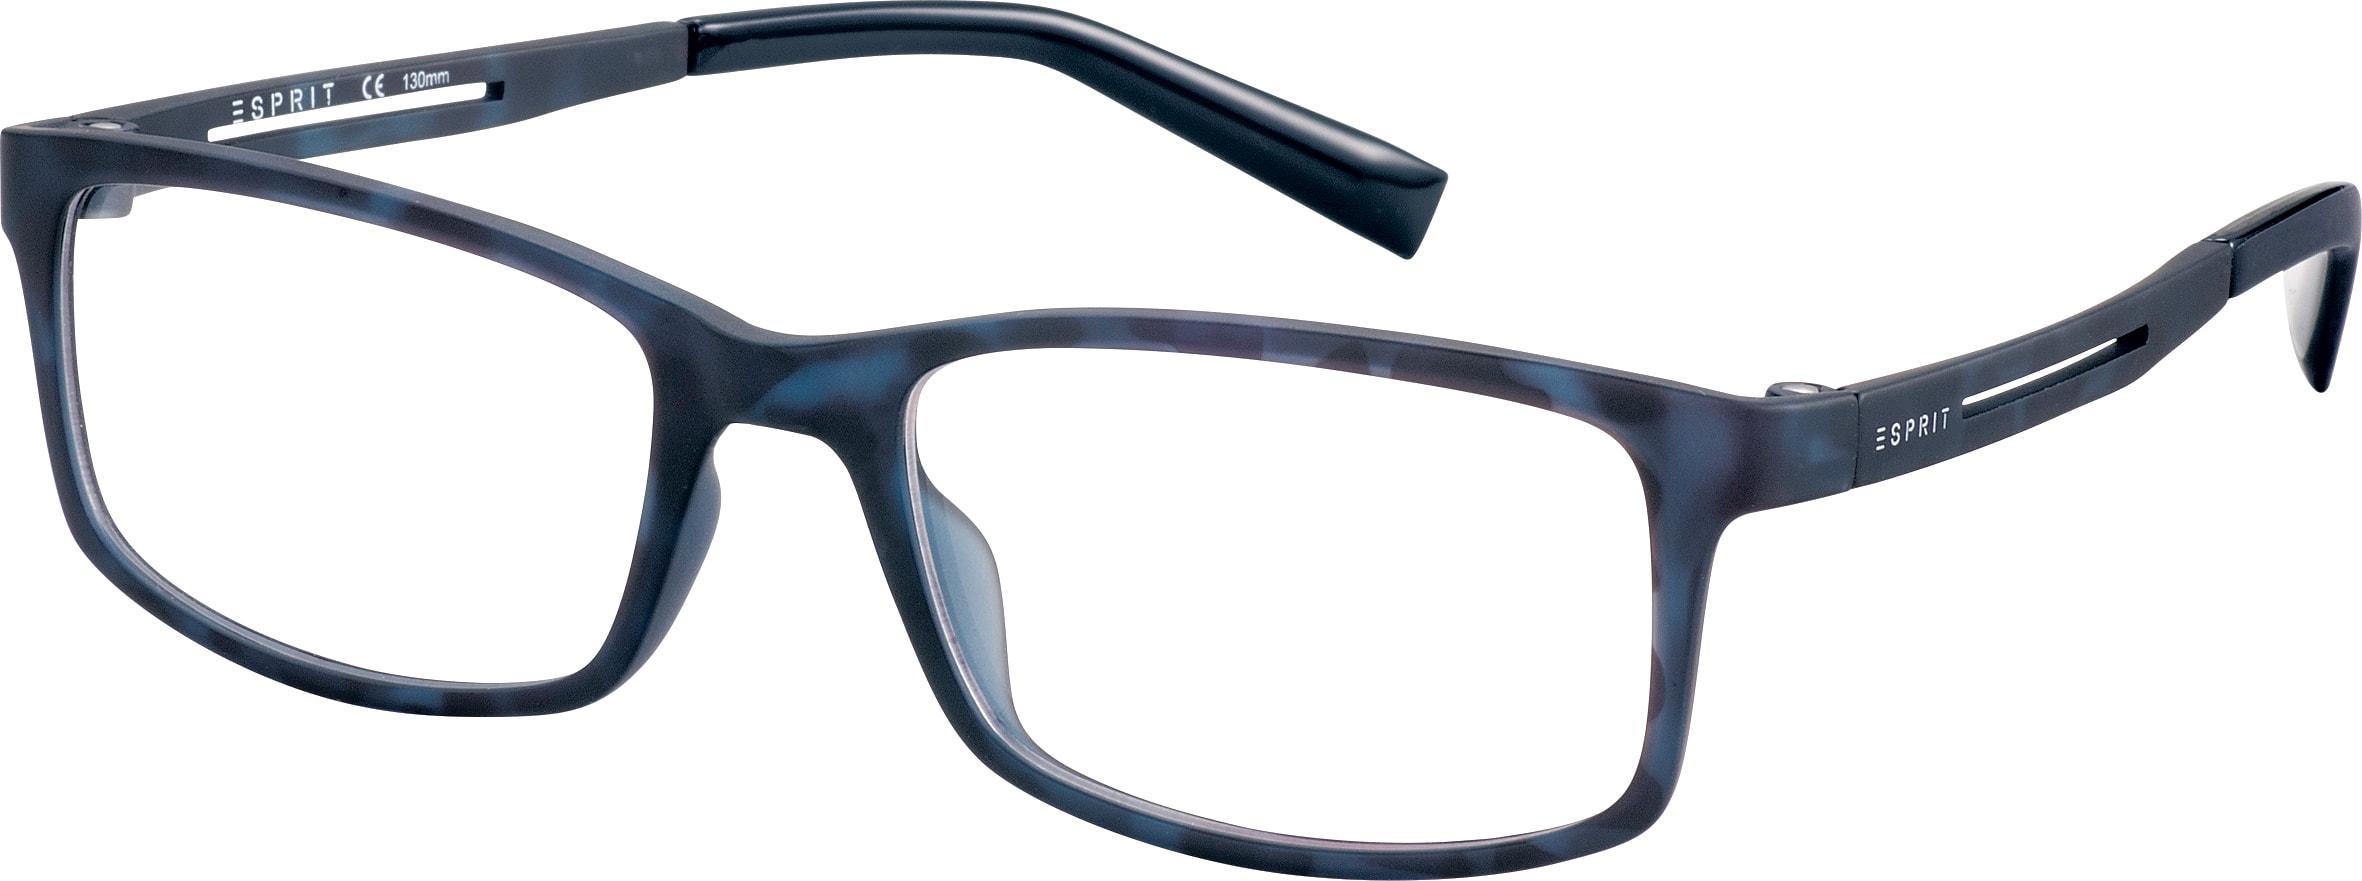 Esprit ET17567 Blau Gr. 49-16